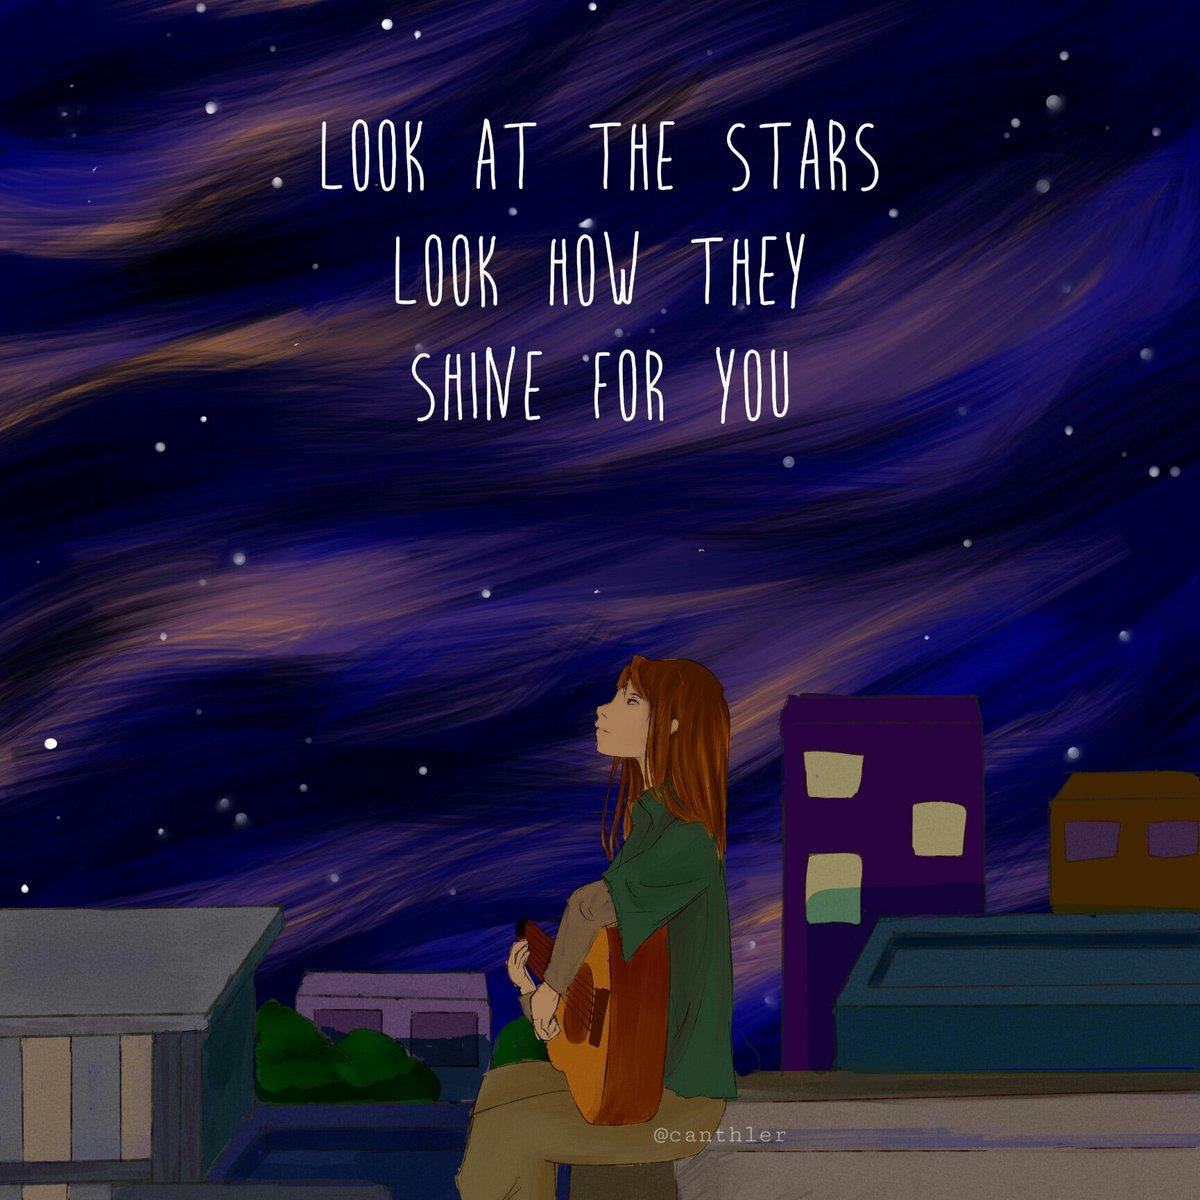 Look at the stars look how they shine for you ✨ • • #stars #starrysky #sky #star #starrynight #lockscreen #yellow #coldplay #quotes #illustration #digi #digitaldrawing #digital_art #art #artwork #illust #instaart #digitalillustration #artoftheday #artworks #myart https://t.co/hIqVdG5DwJ